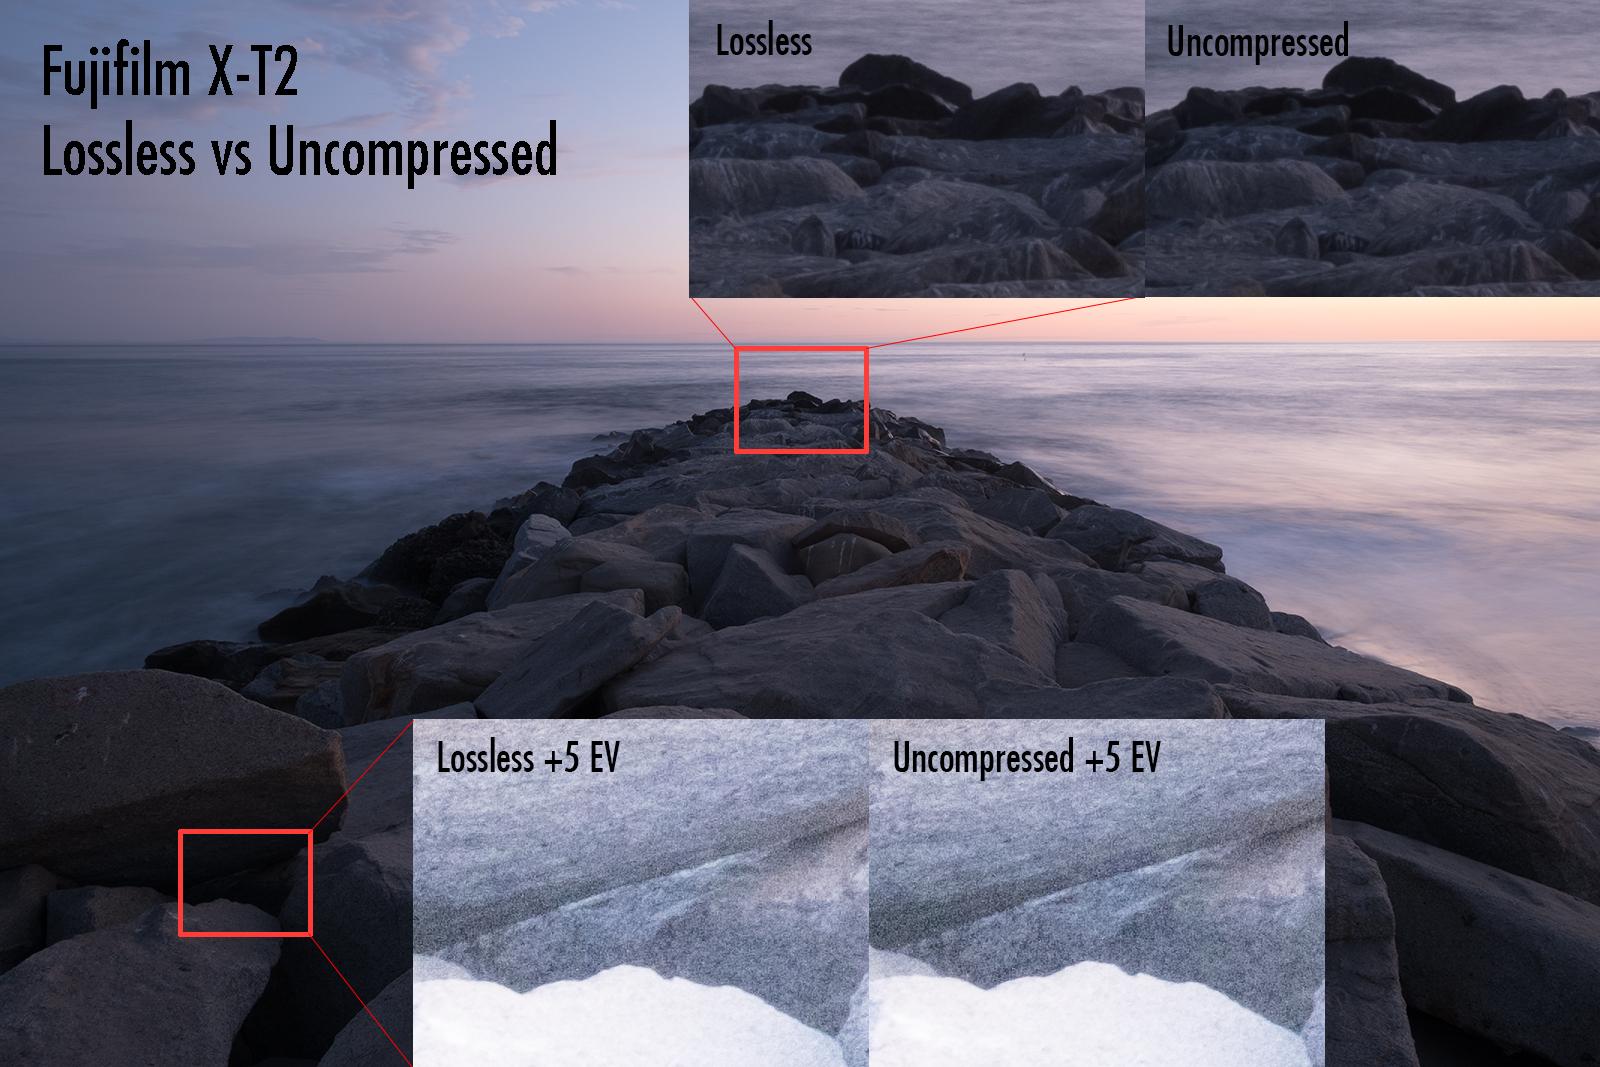 Fujifilm X-T2 Lossless vs Uncompressed